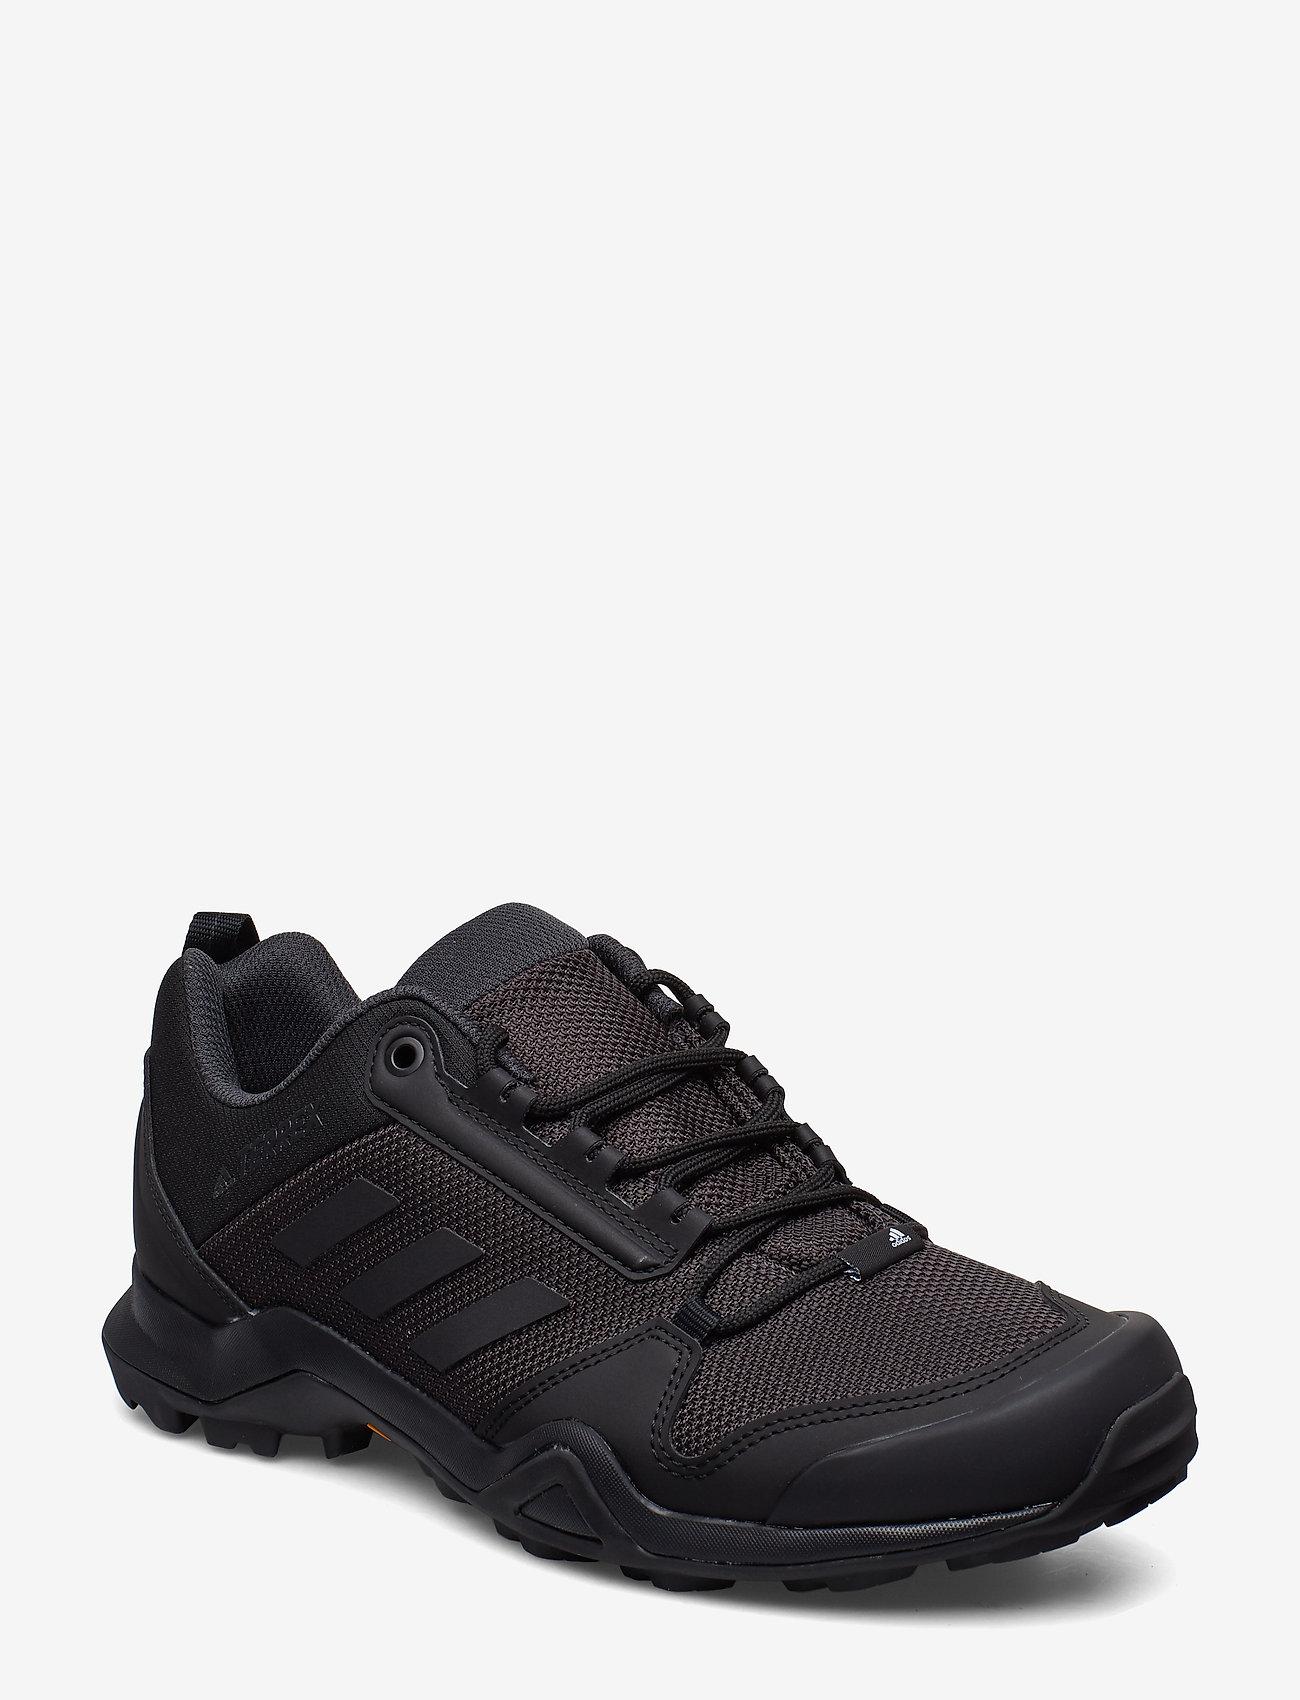 adidas Performance - TERREX AX3 - löbesko - cblack/cblack/carbon - 0